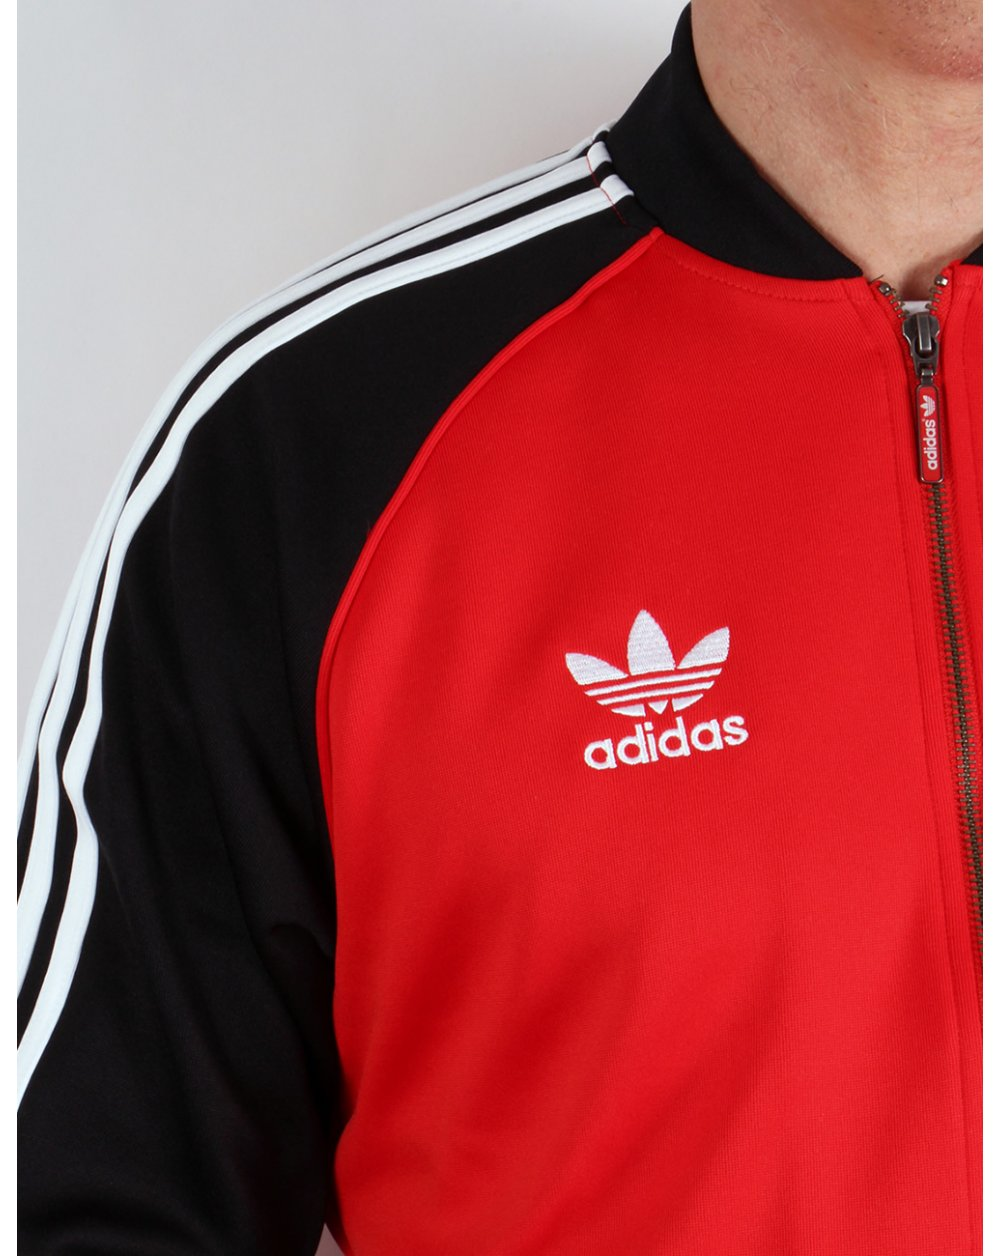 adidas superstar track top black red